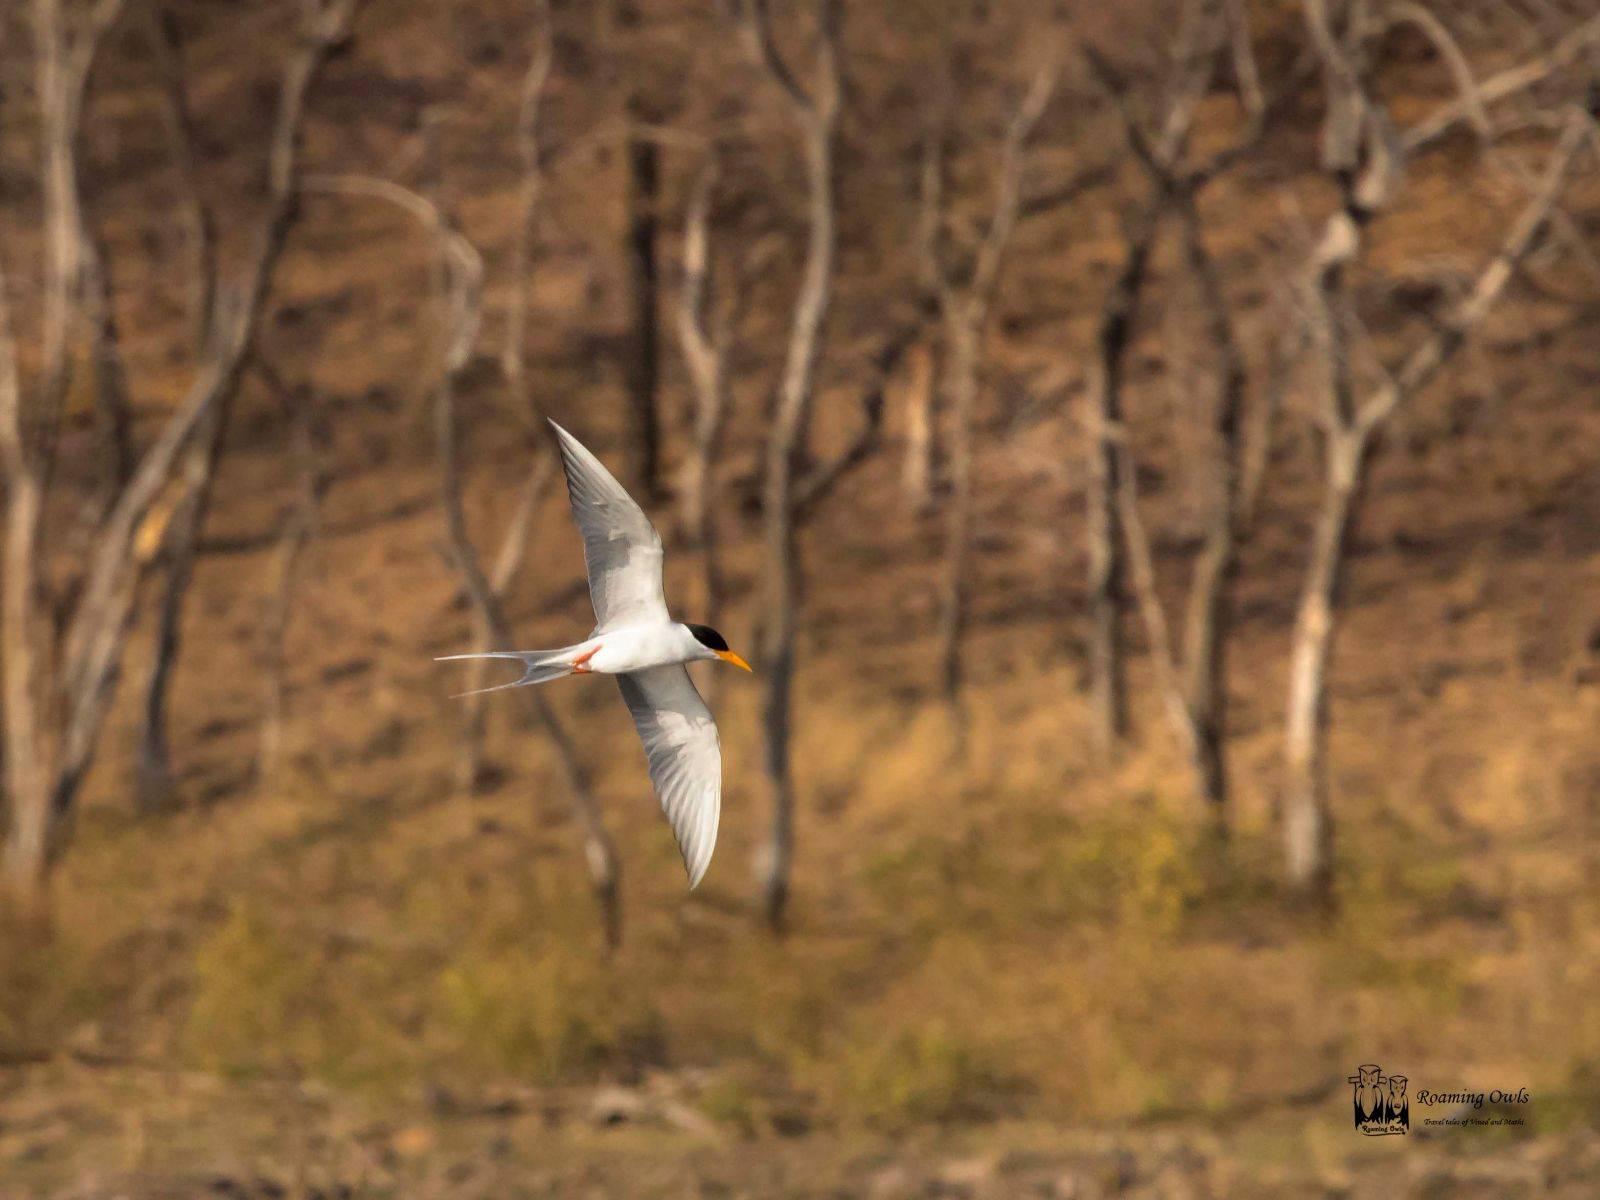 River Tern,Sterna aurantia,India Near Threatened,Ranthambore Birds,Indian Birds